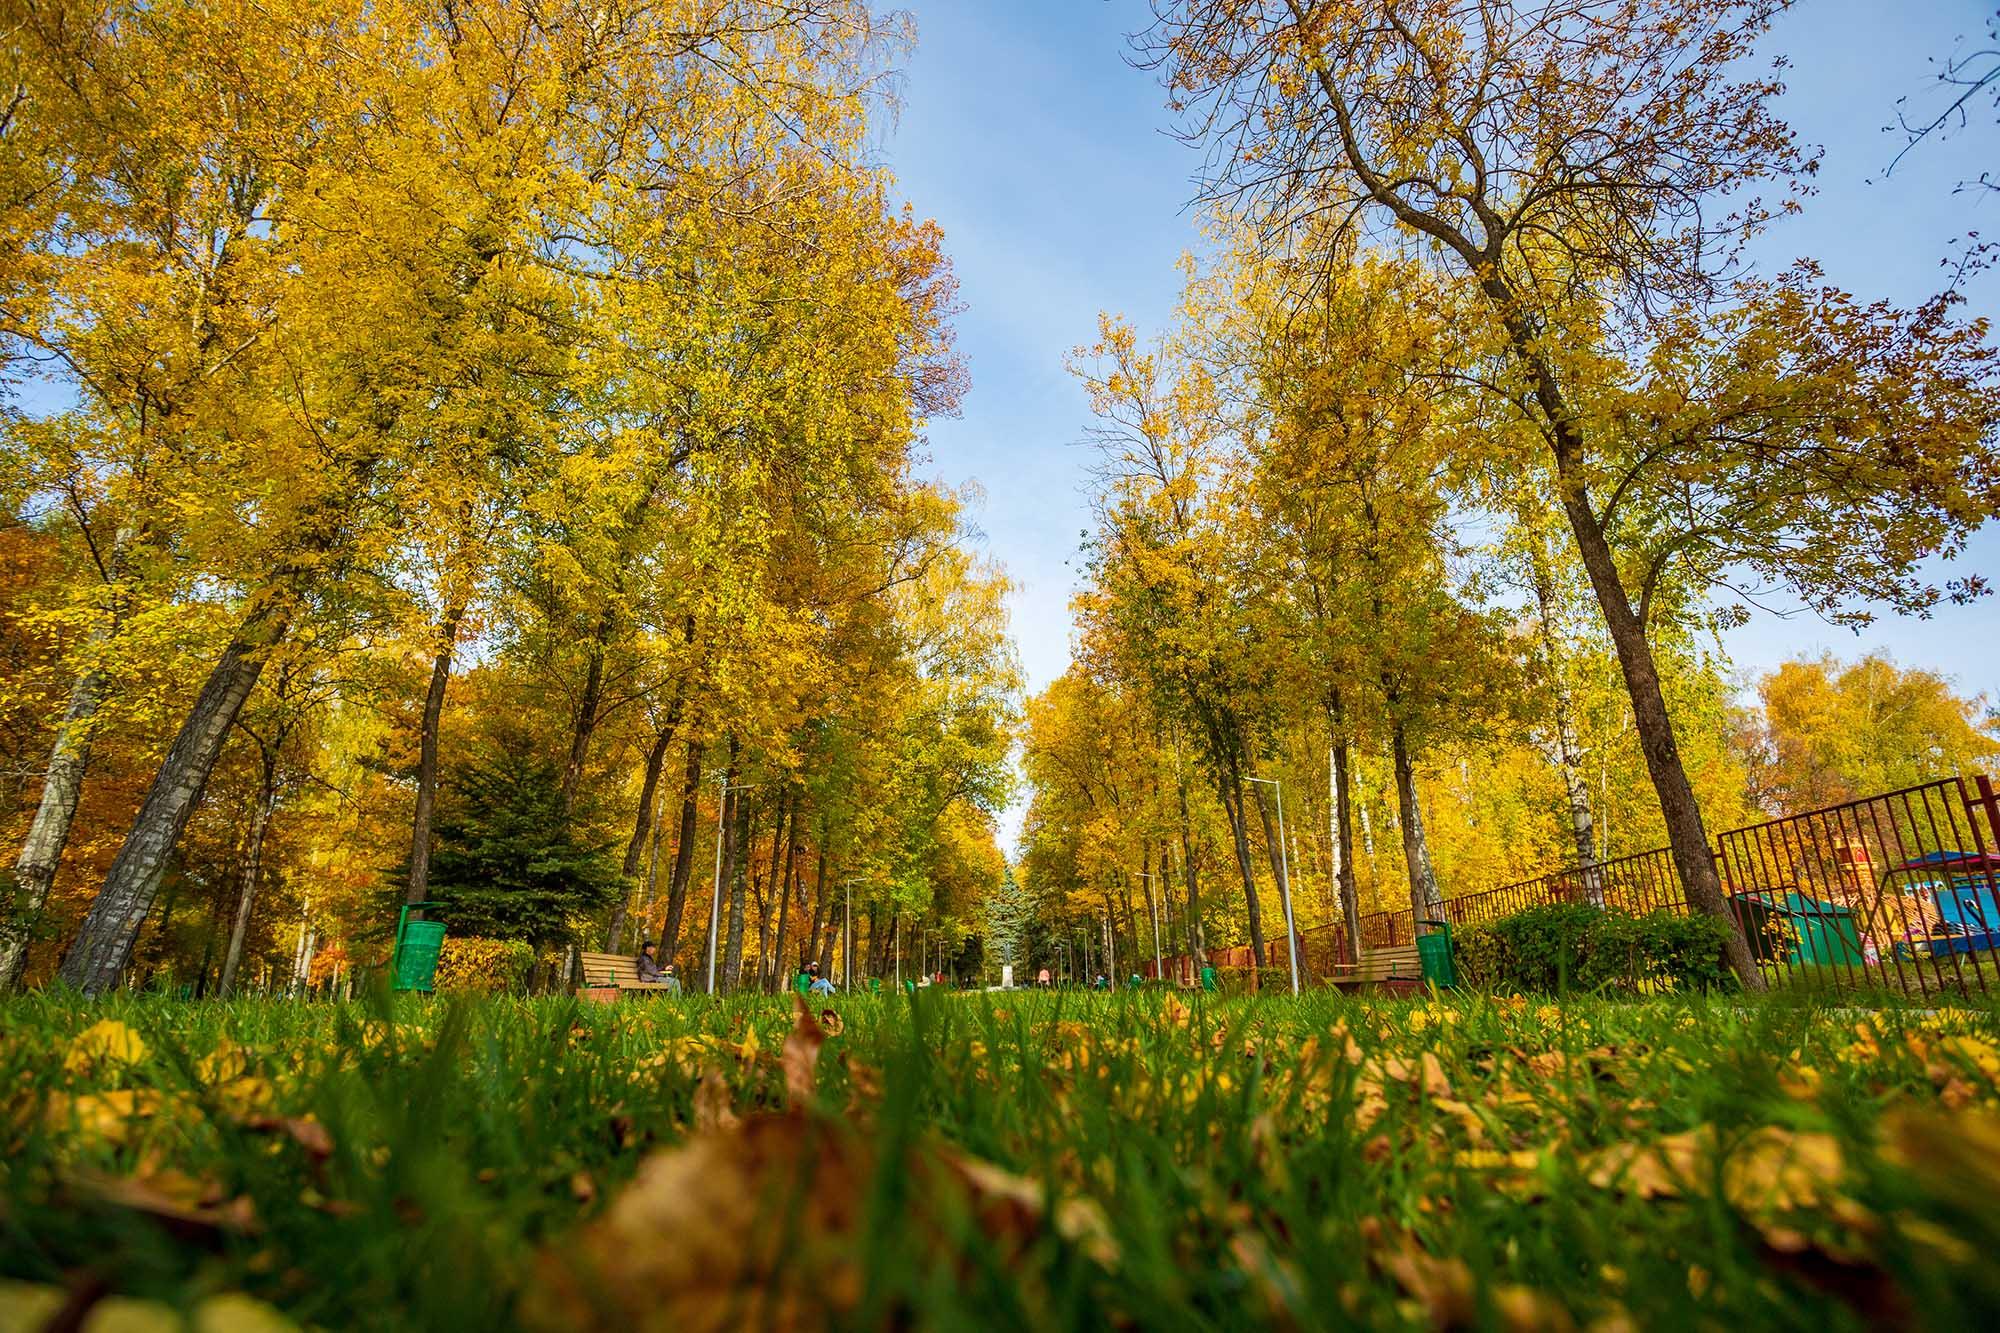 Парк культуры и отдыха имени А.П. Гайдара